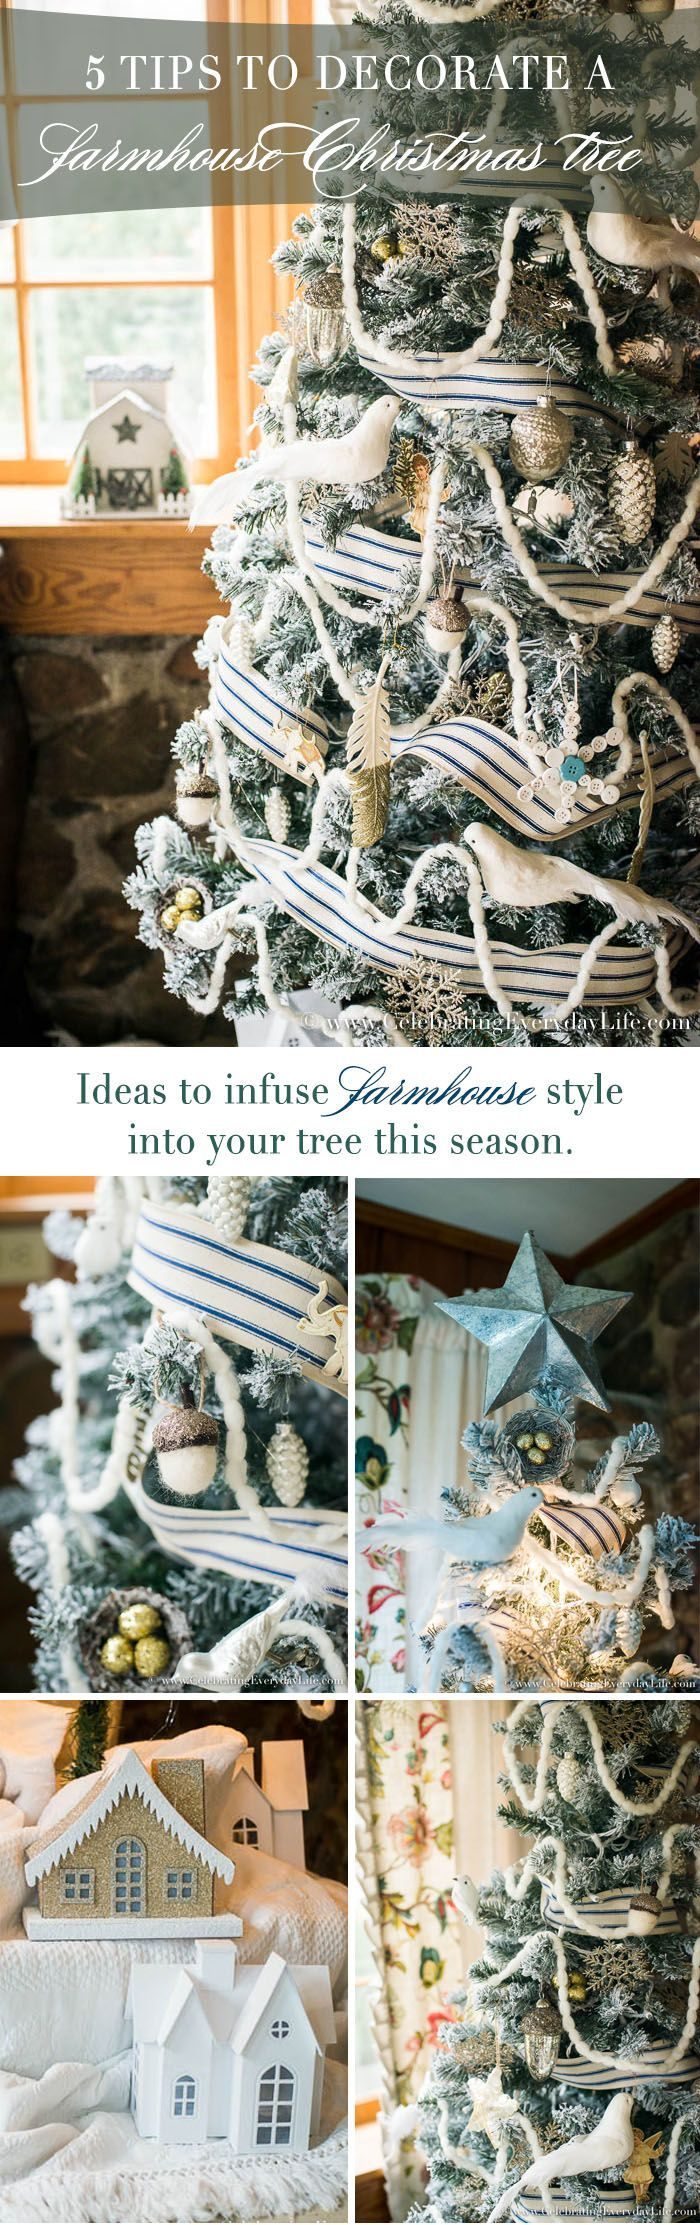 5 Tips to Decorate a Farmhouse Christmas Tree | Celebrating Everyday Life with Jennifer Carroll | http://www.CelebratingEverydayLife.com